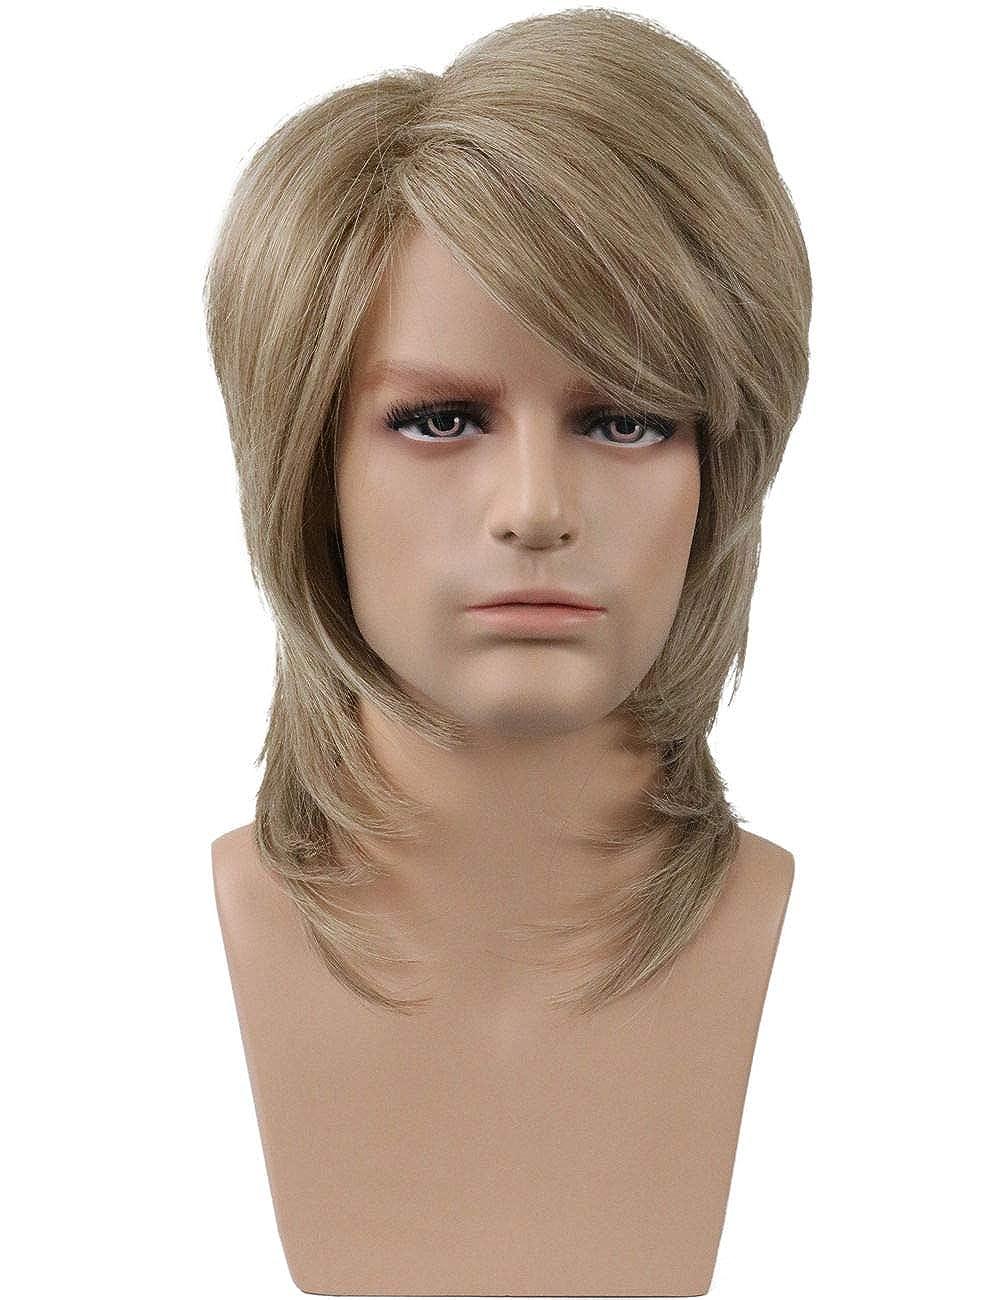 Mullet Wig Blonde 80/'s Joe Dirt Fancy Dress Up Halloween Adult Costume Accessory